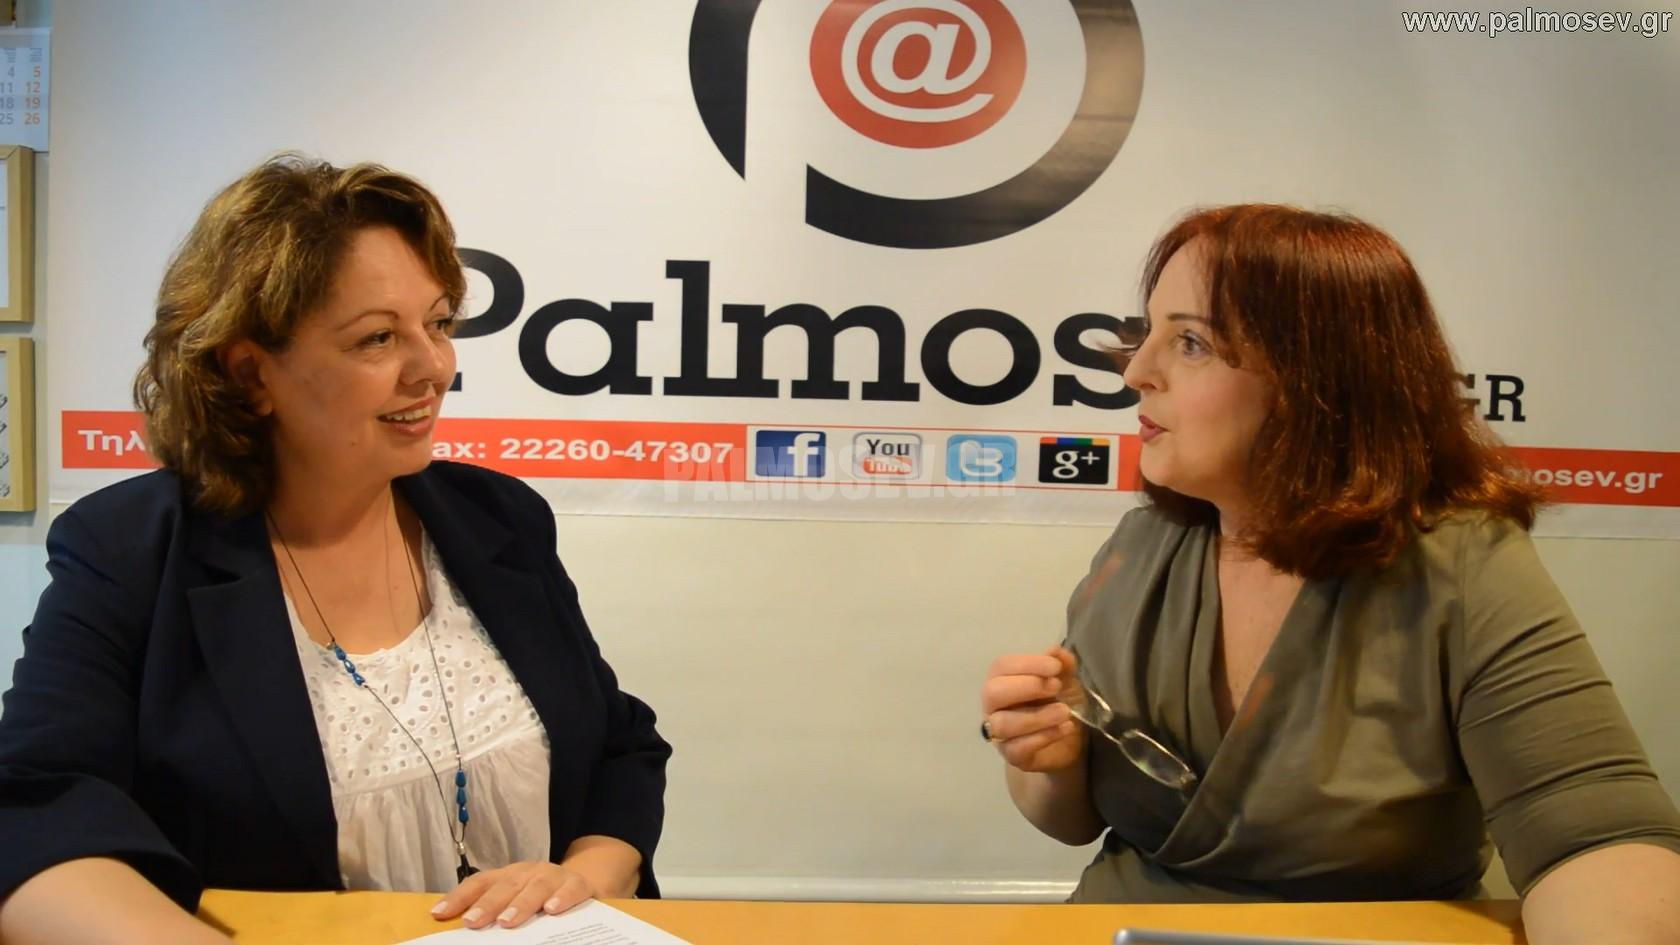 062513ef7ac6 Μια συζήτηση με την υποψήφια Περιφερειακή Σύμβουλο Ελισσάβετ Ρουμελιώτου  και τη δημοσιογράφο Πάρη Ντελκή